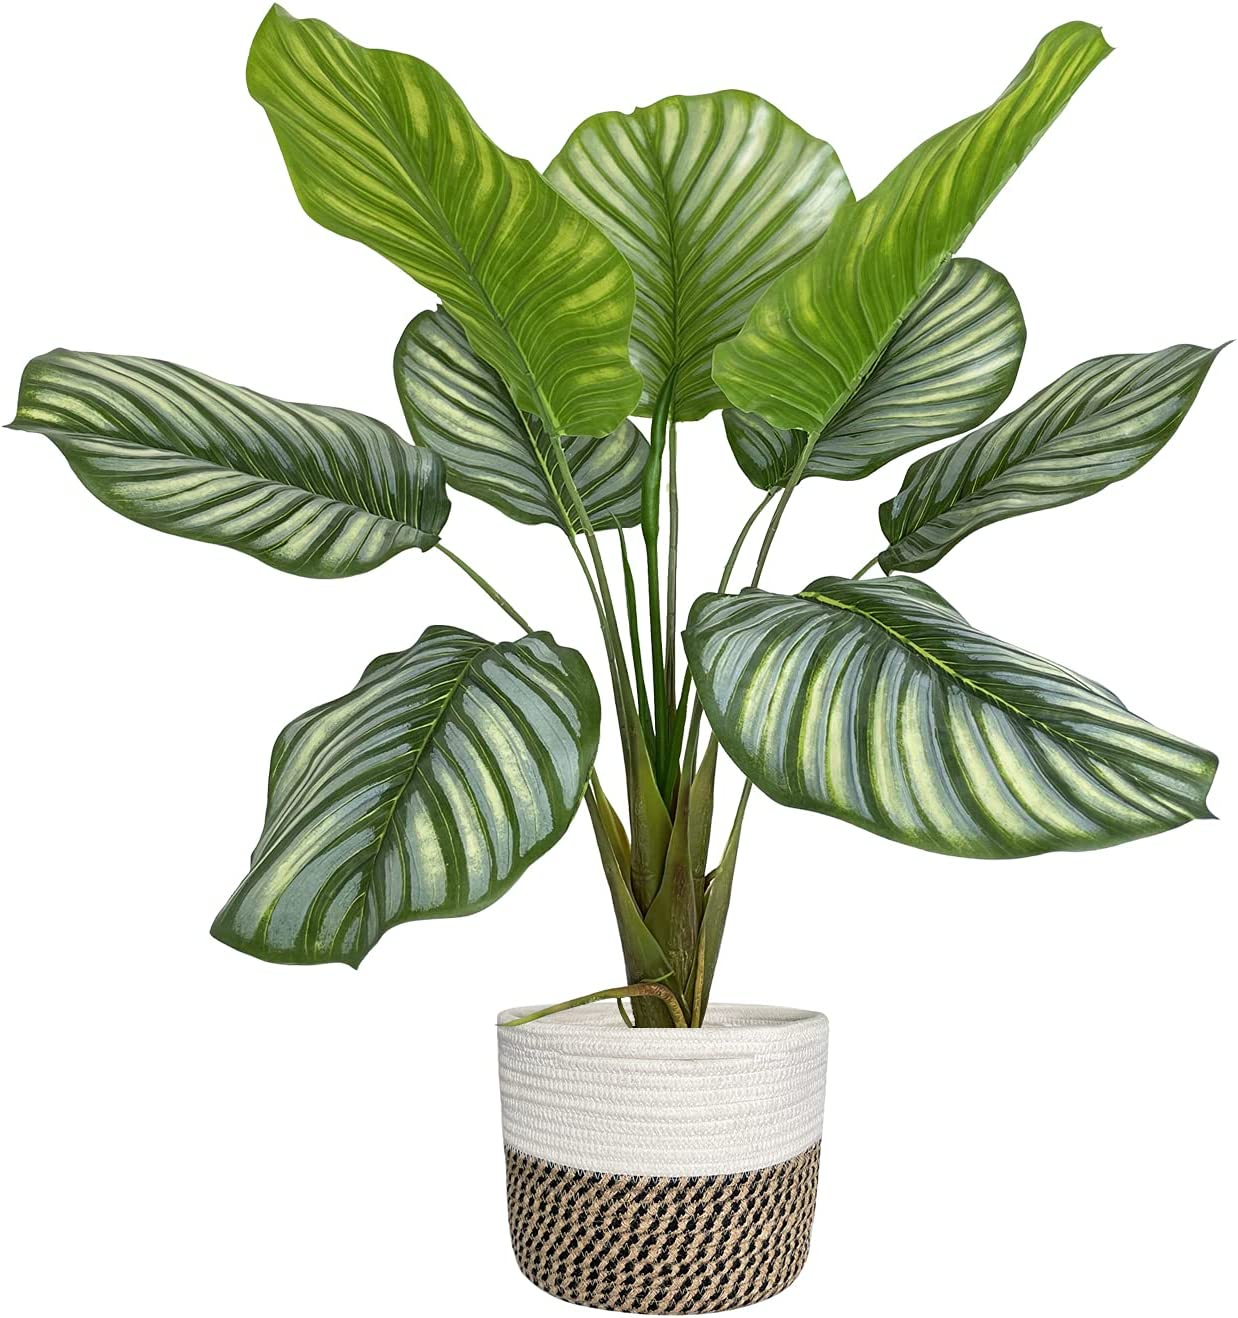 BESAMENATURE Artificial Calathea Popularity Regular dealer Orbifolia Artifi Potted Plants